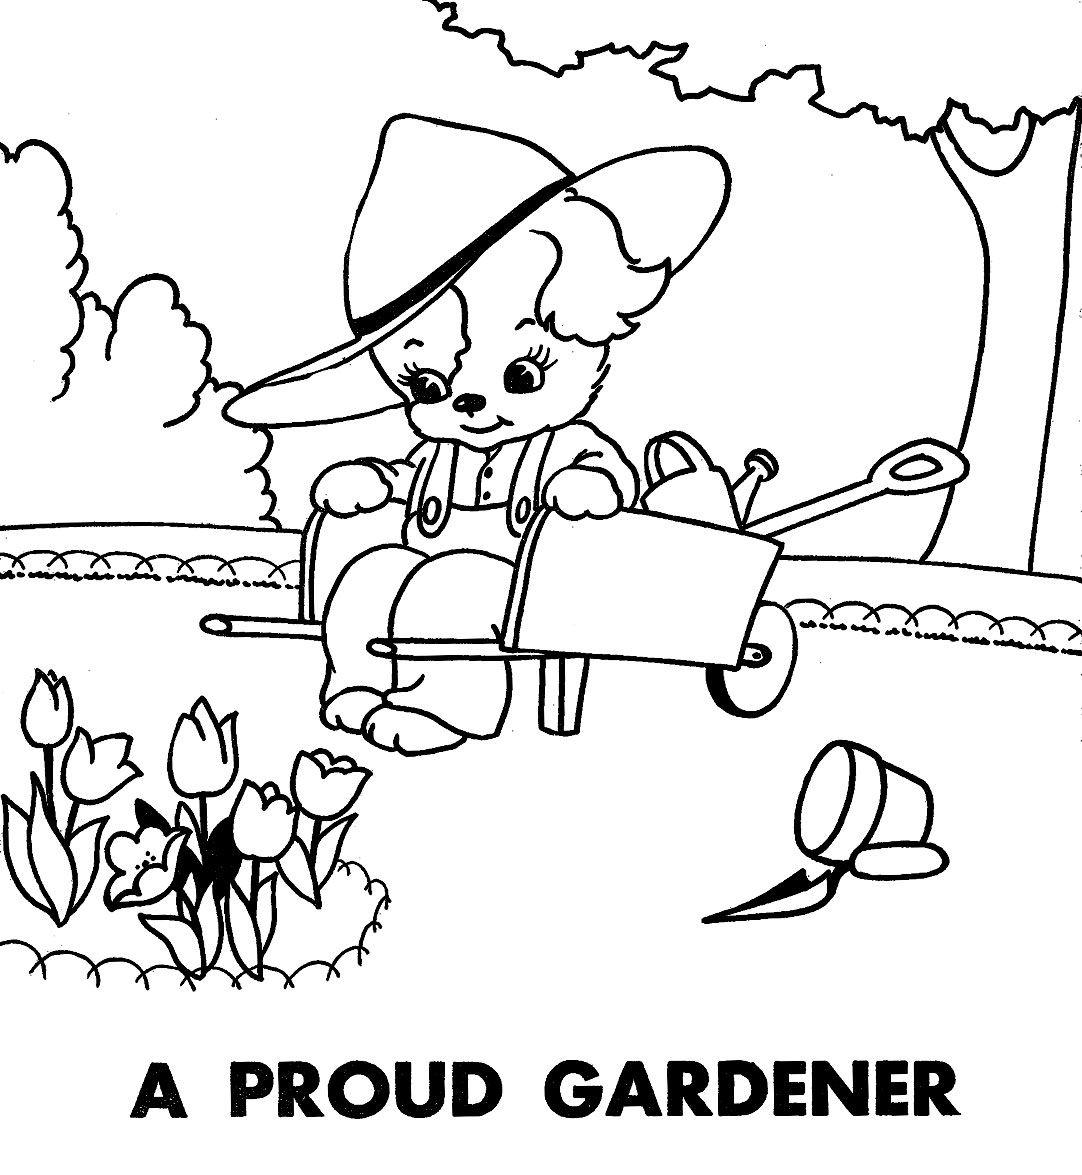 pb-a-proud-gardener.jpg 1,082×1,175 pixels | babies | Pinterest